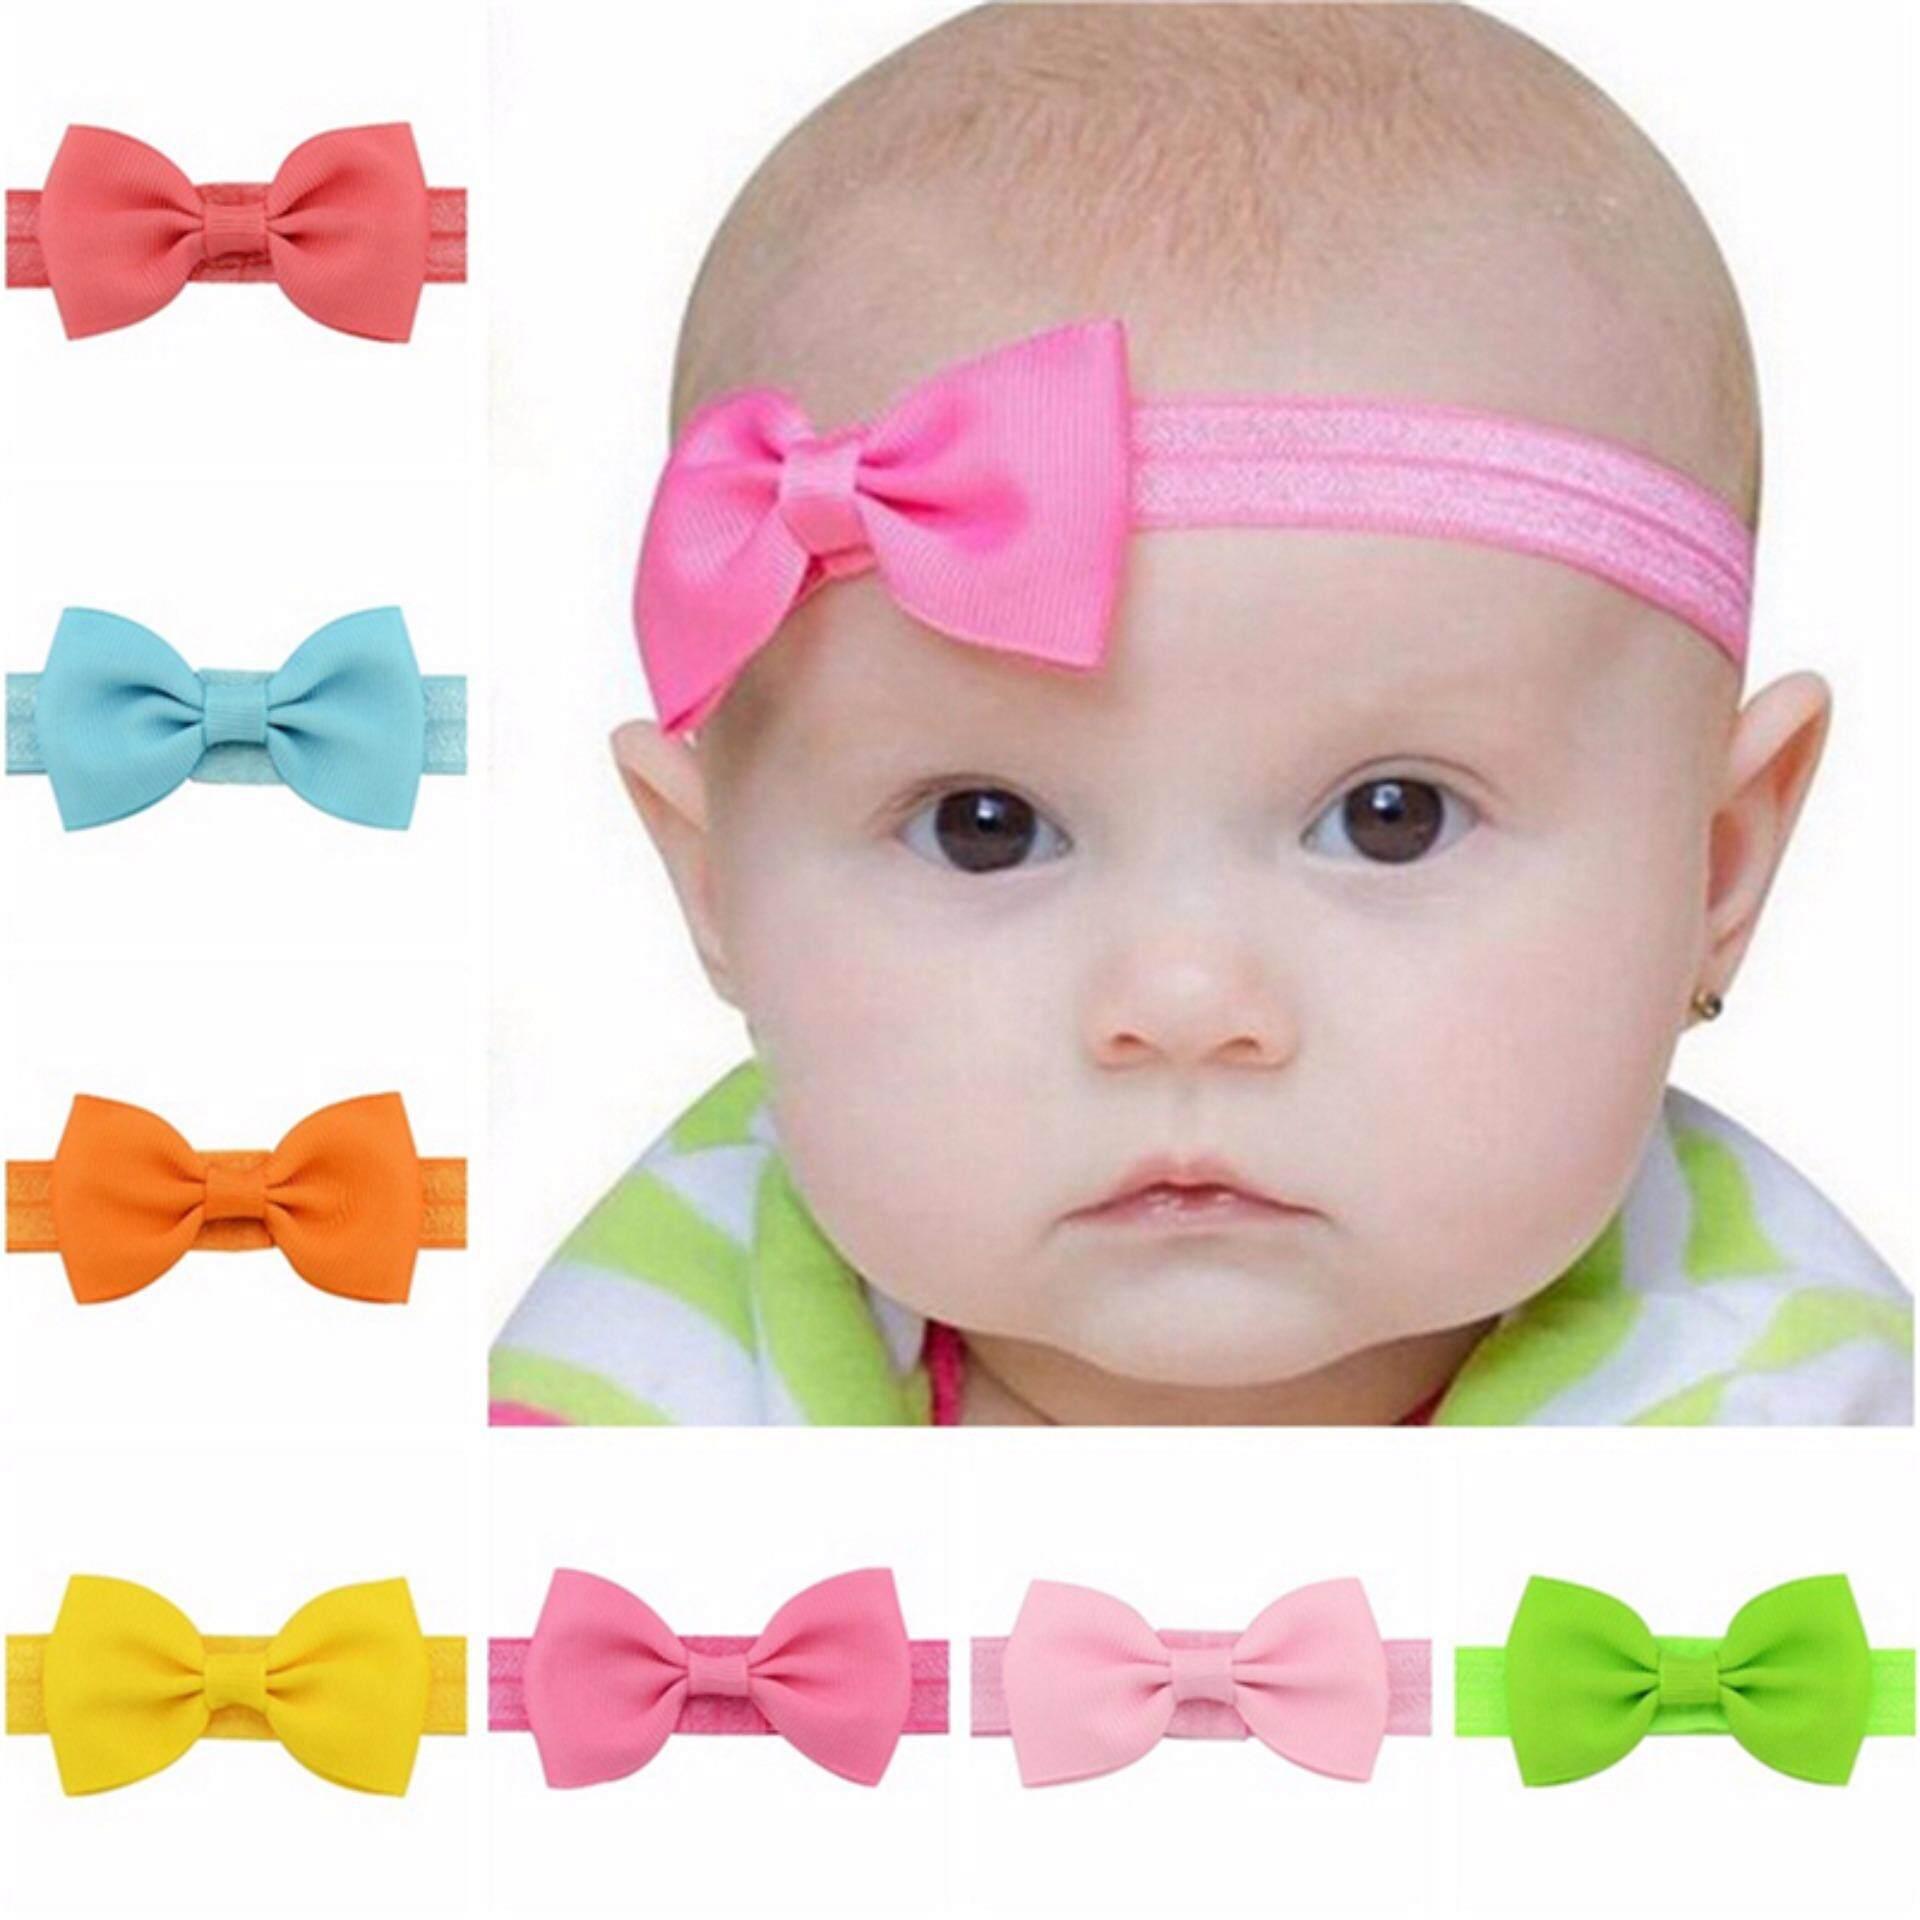 be1cdd789593e 20pcs Soft Baby Girls Bow Headband Hairband Elastic Band Hair Accessories  Bow